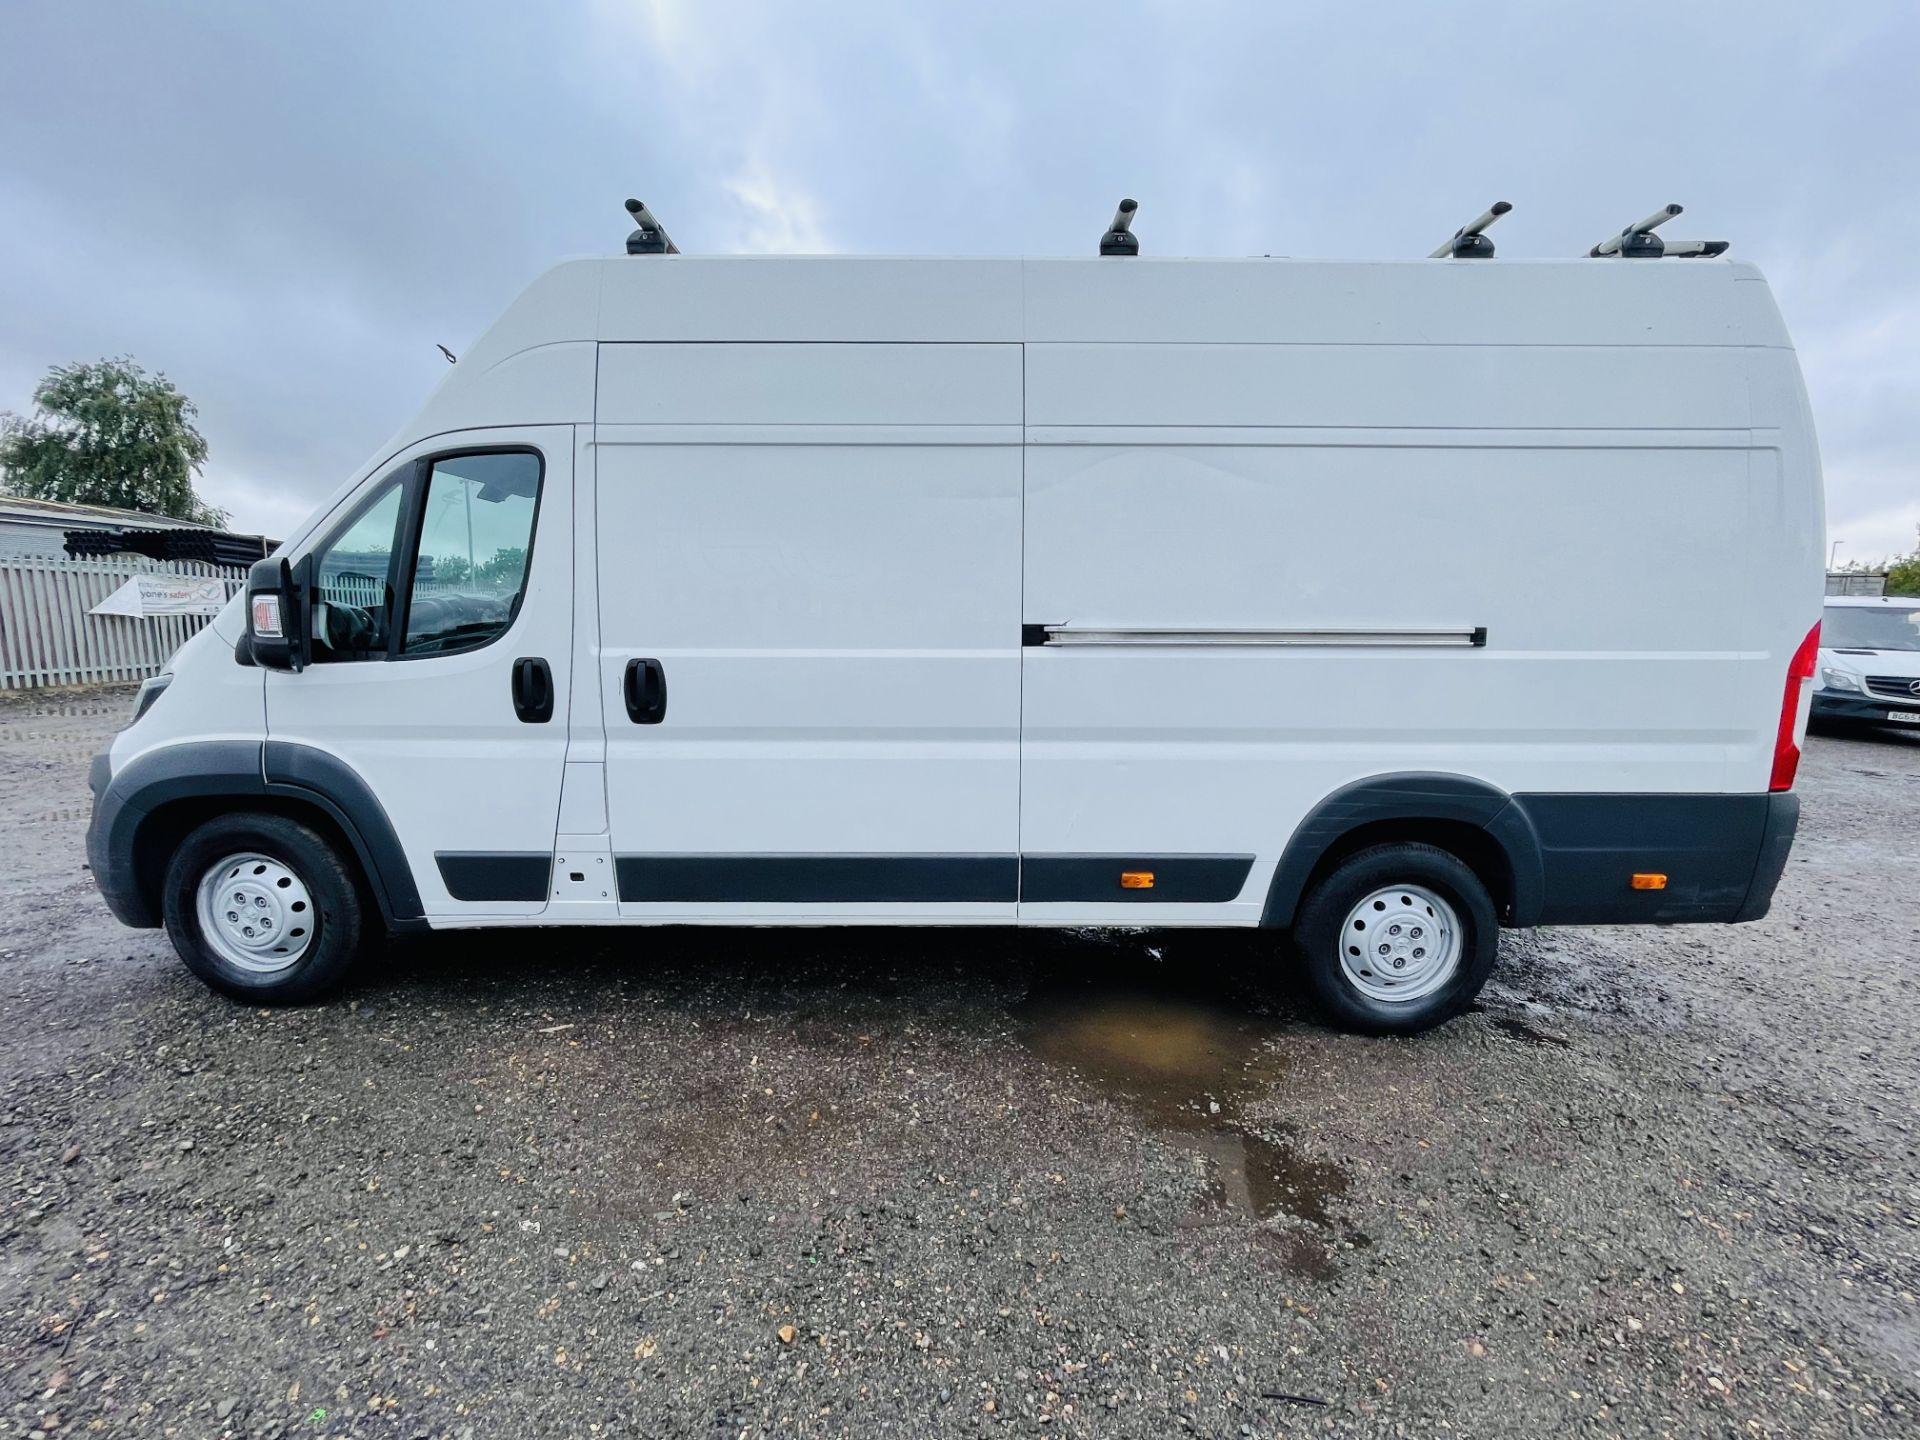 ** ON SALE ** Peugeot Boxer 2.0 BlueHDI L4 H3 2017 '66 Reg' Panel Van - LCV - Euro 6b ULEZ Compliant - Image 6 of 18